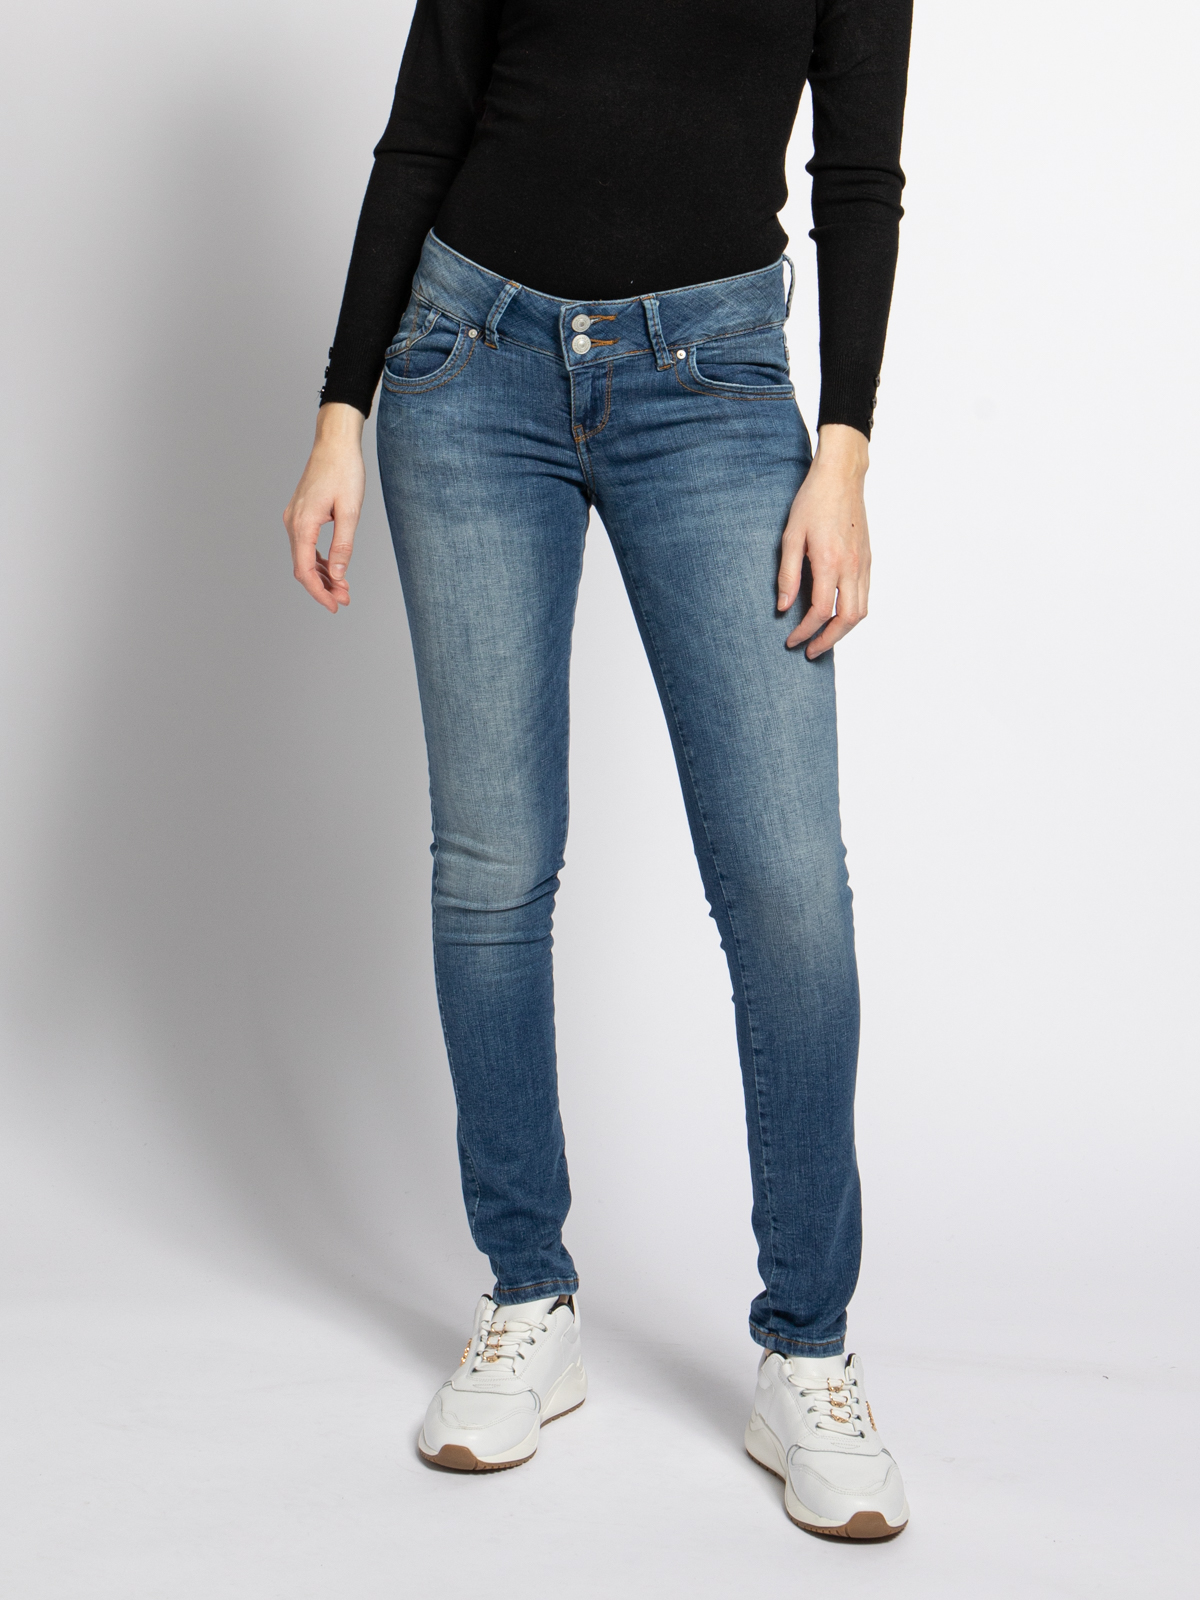 LTB Molly Jeans in blau für Damen, Größe: 25-34. Molly